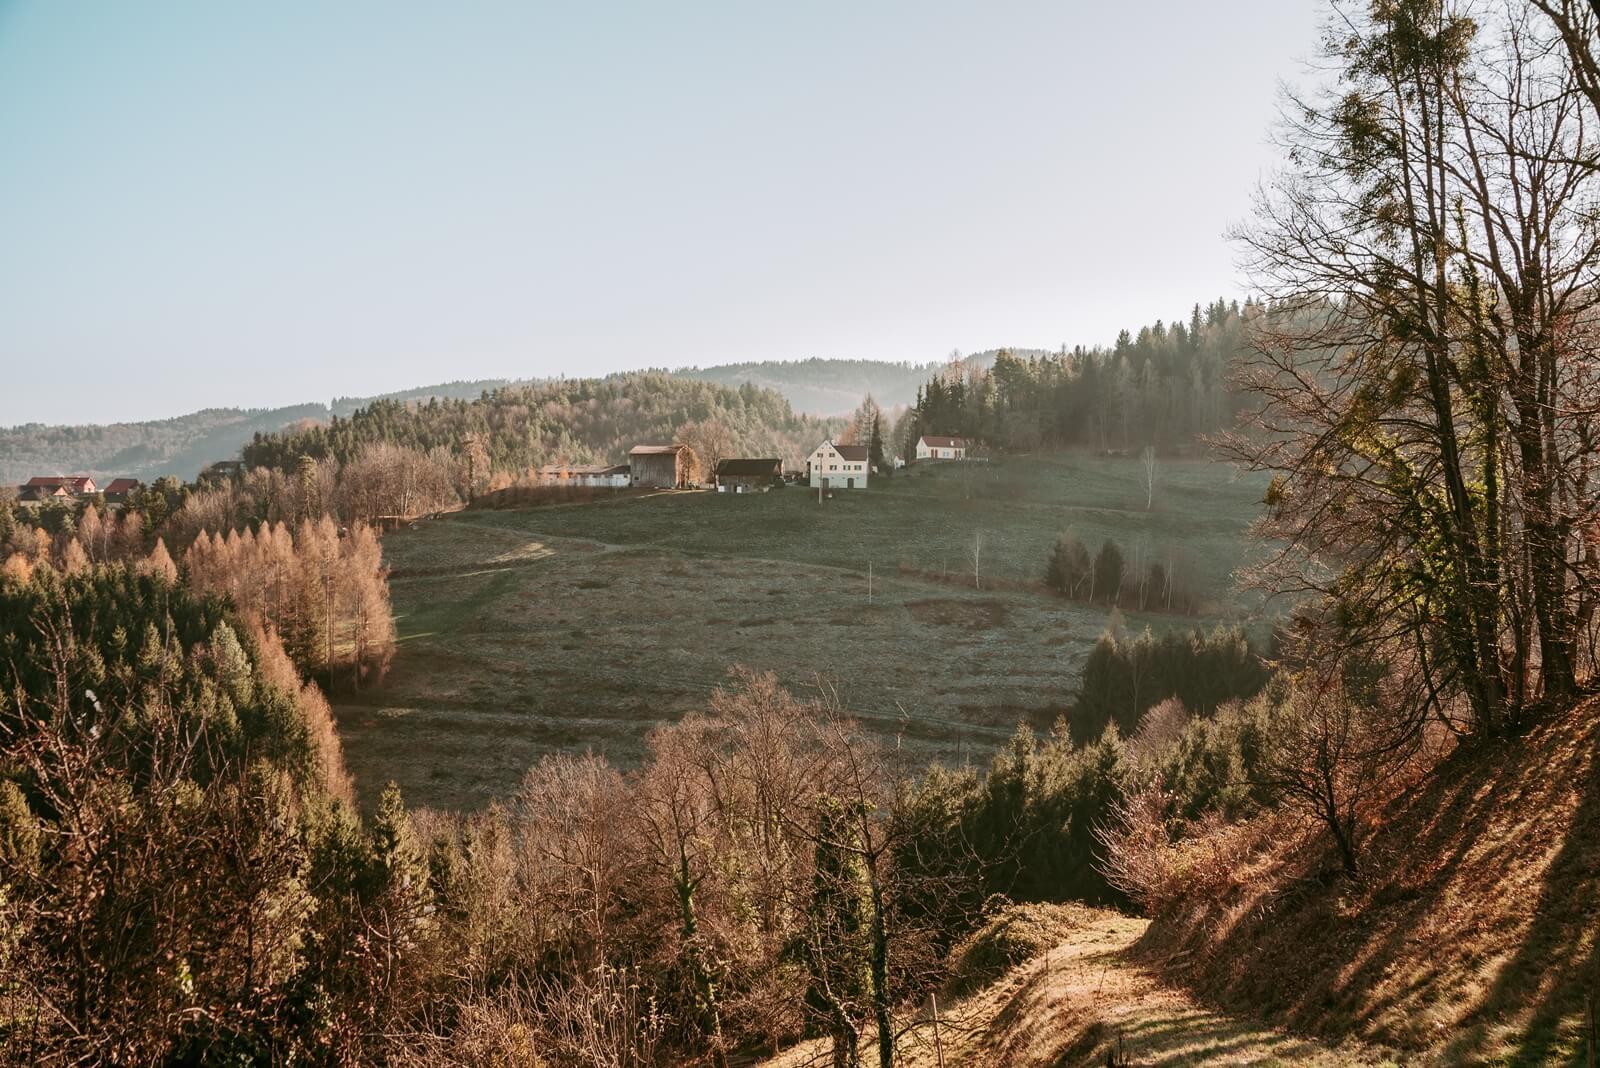 styria-austria-lavienblog-allrightsreserved2